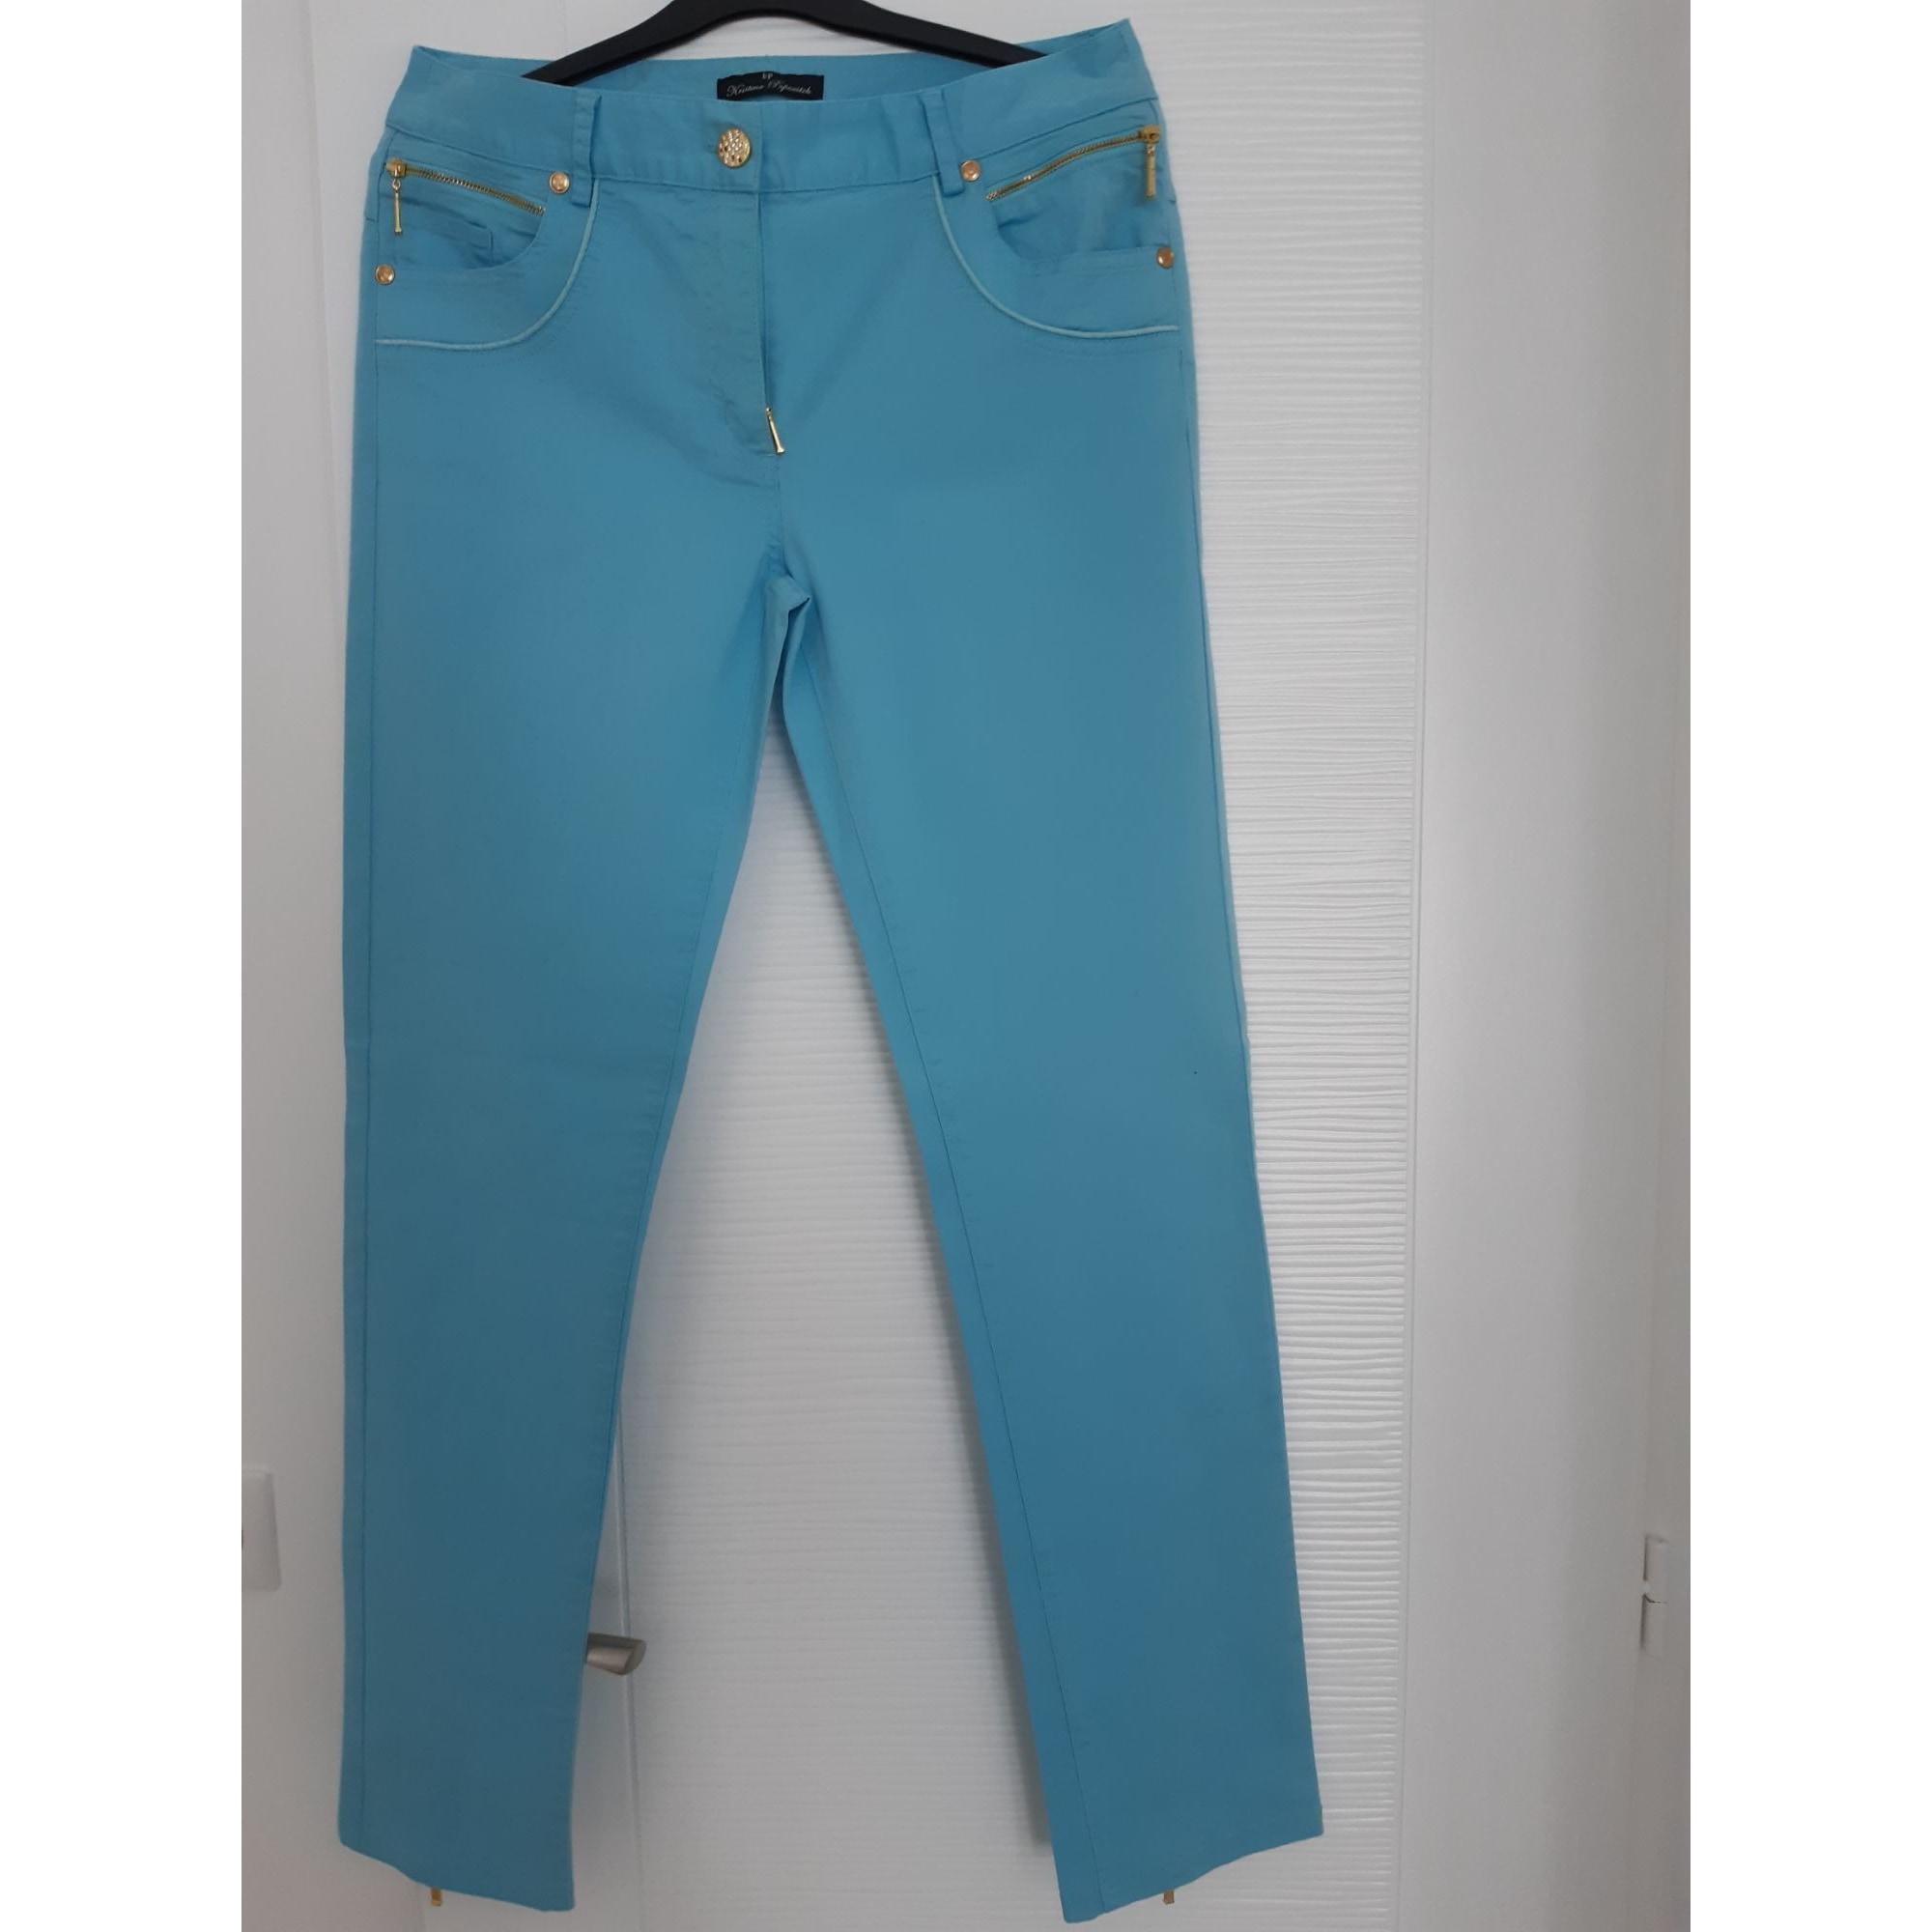 Pantalon droit KRISTINA POPOVITCH Bleu, bleu marine, bleu turquoise